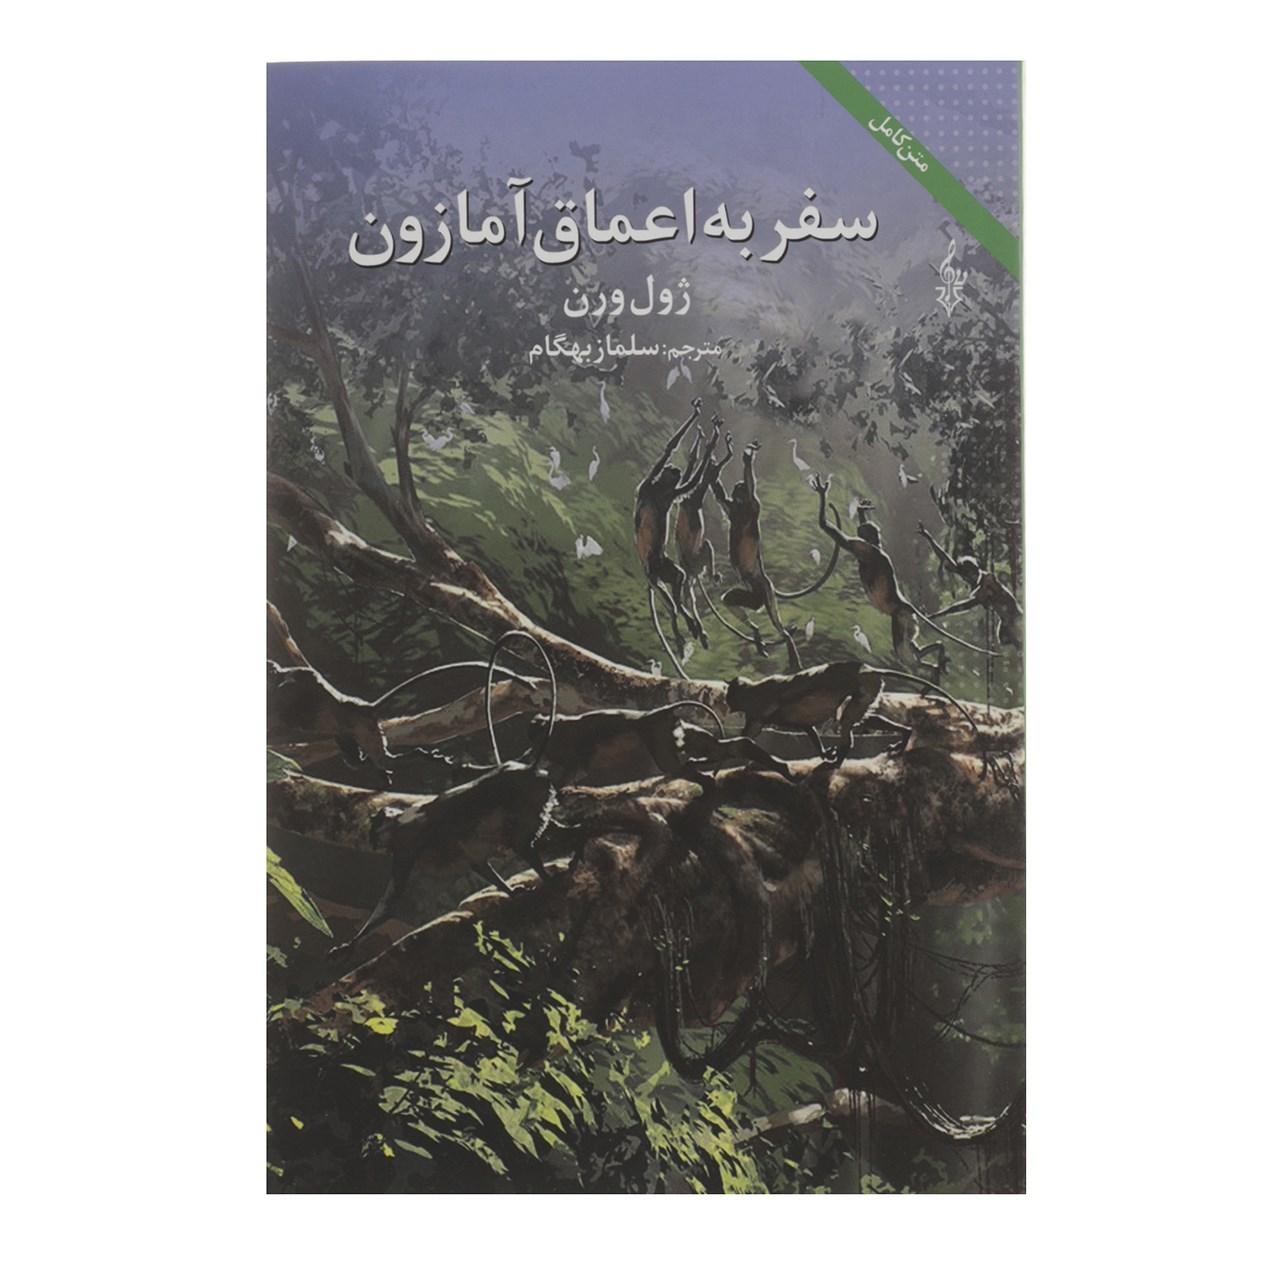 کتاب سفر به اعماق آمازون اثر ژول ورن